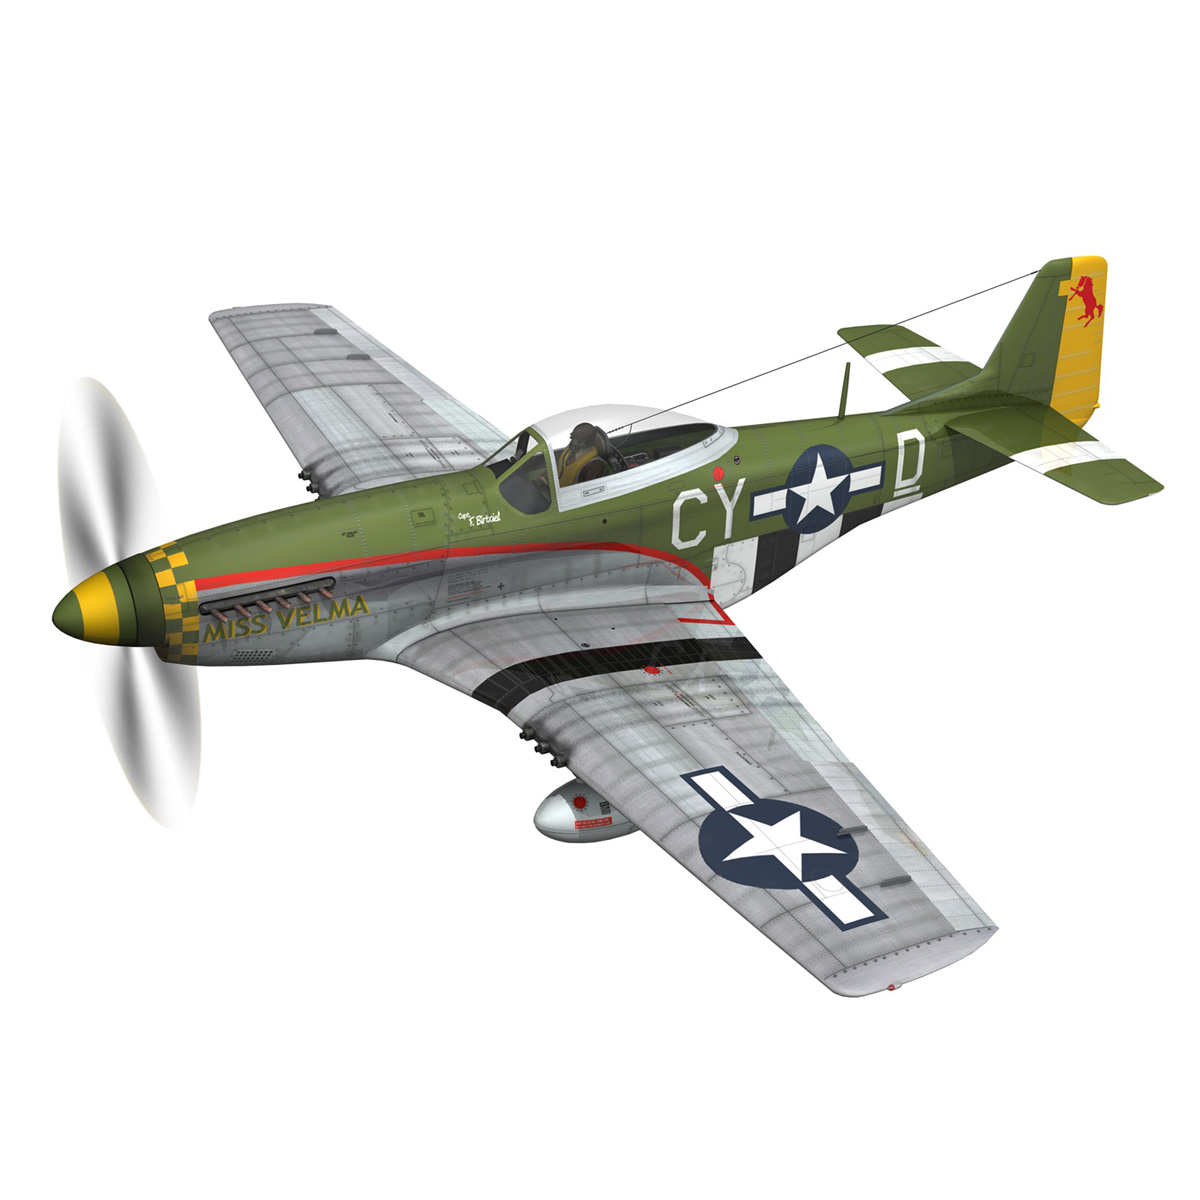 north american p-51d – mustang – miss velma 3d model 3ds fbx c4d lwo obj 267619